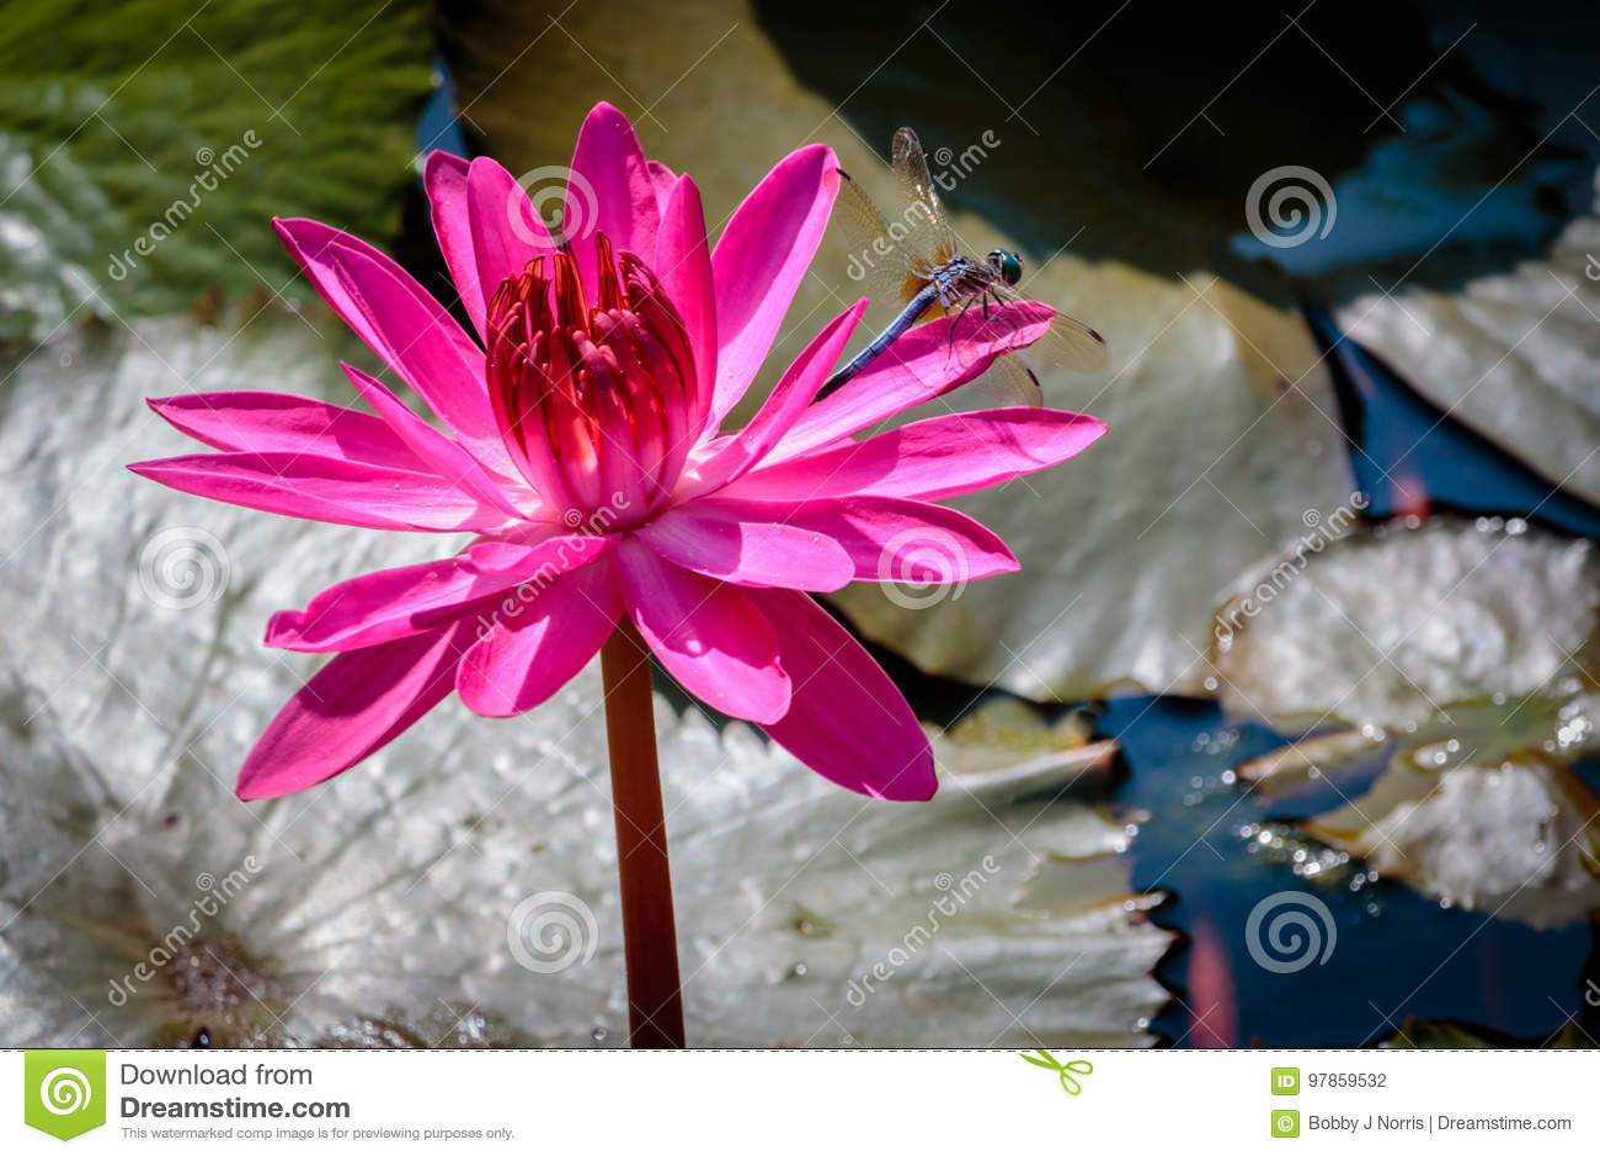 Dragon lily stock photos royalty free pictures izmirmasajfo